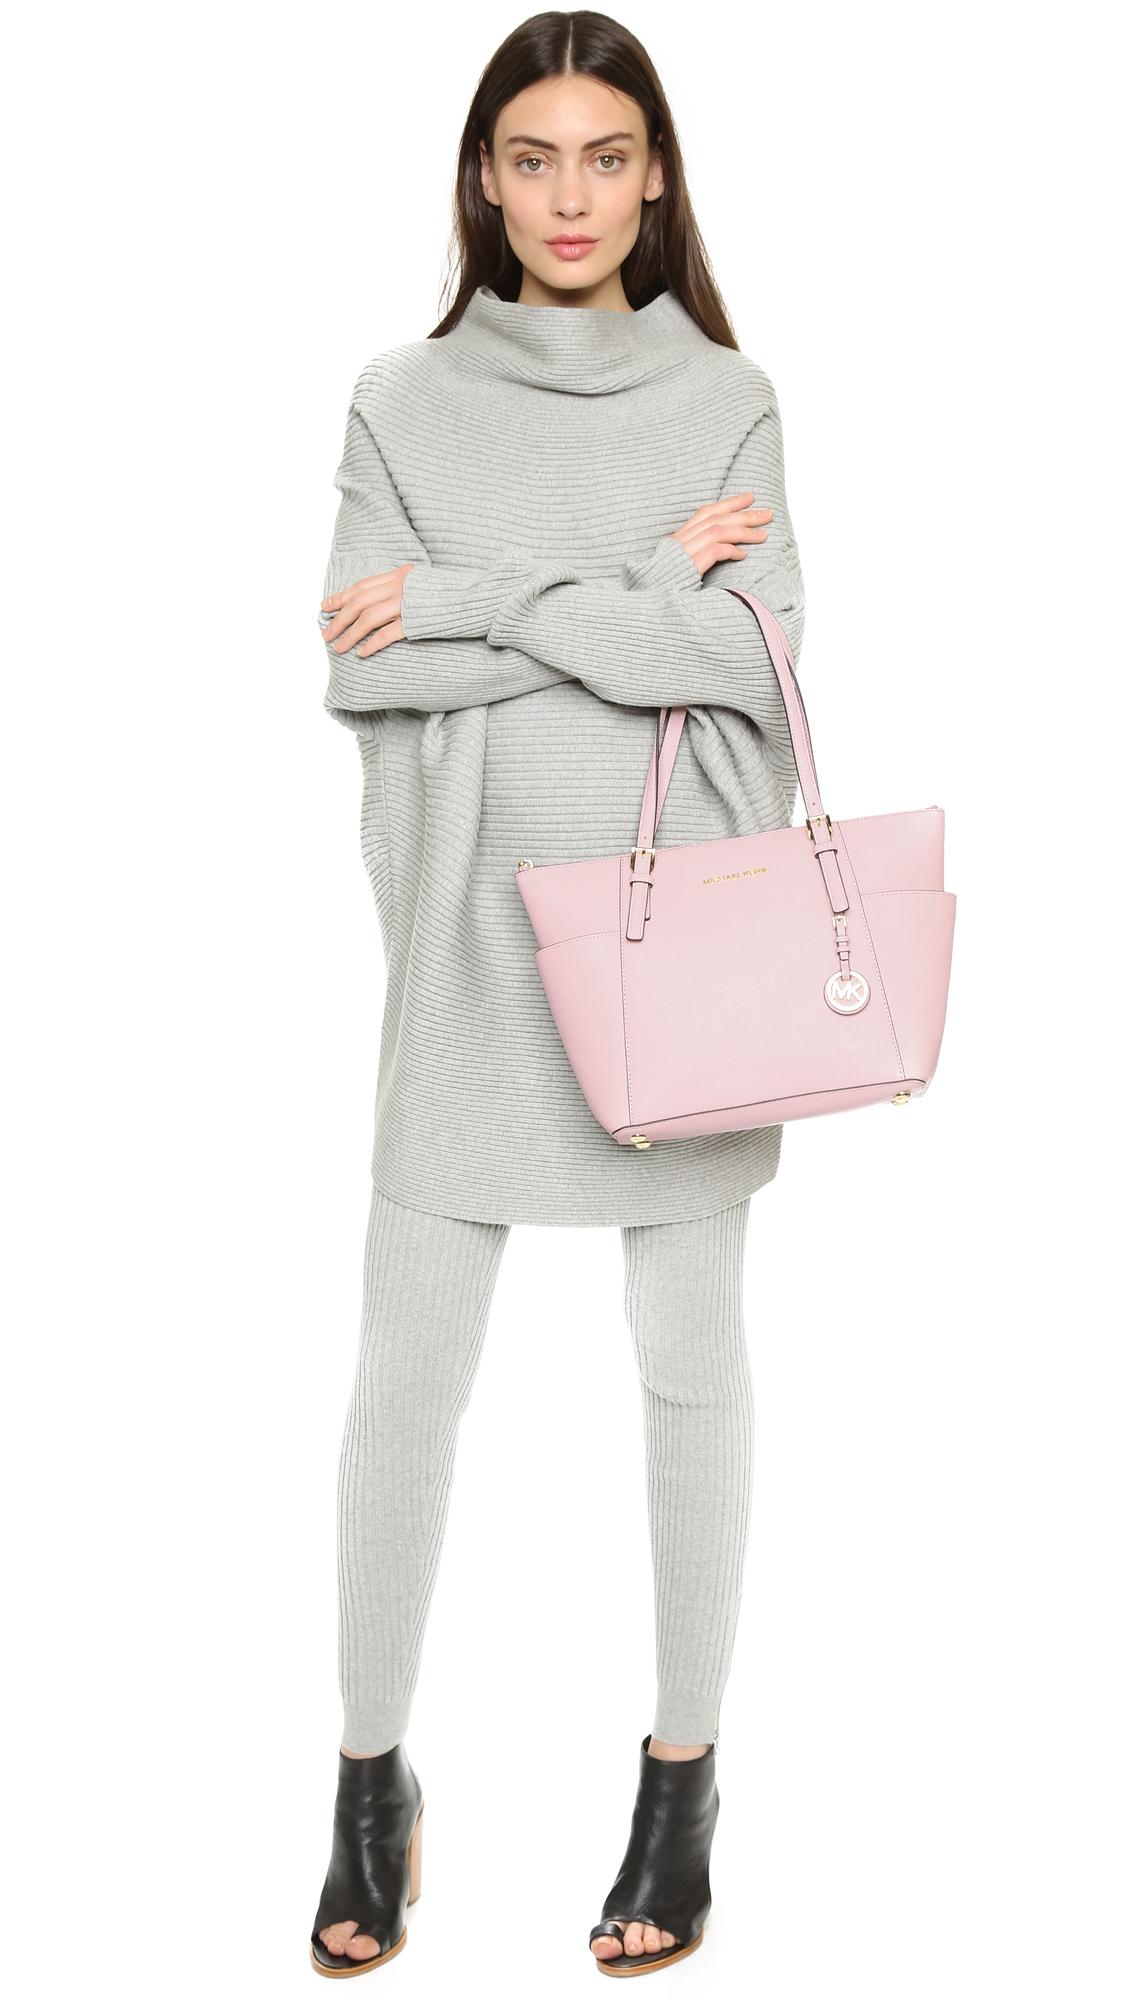 ffae04c1cad Lyst - MICHAEL Michael Kors Jet Set Top-zip Saffiano Tote Bag in Pink